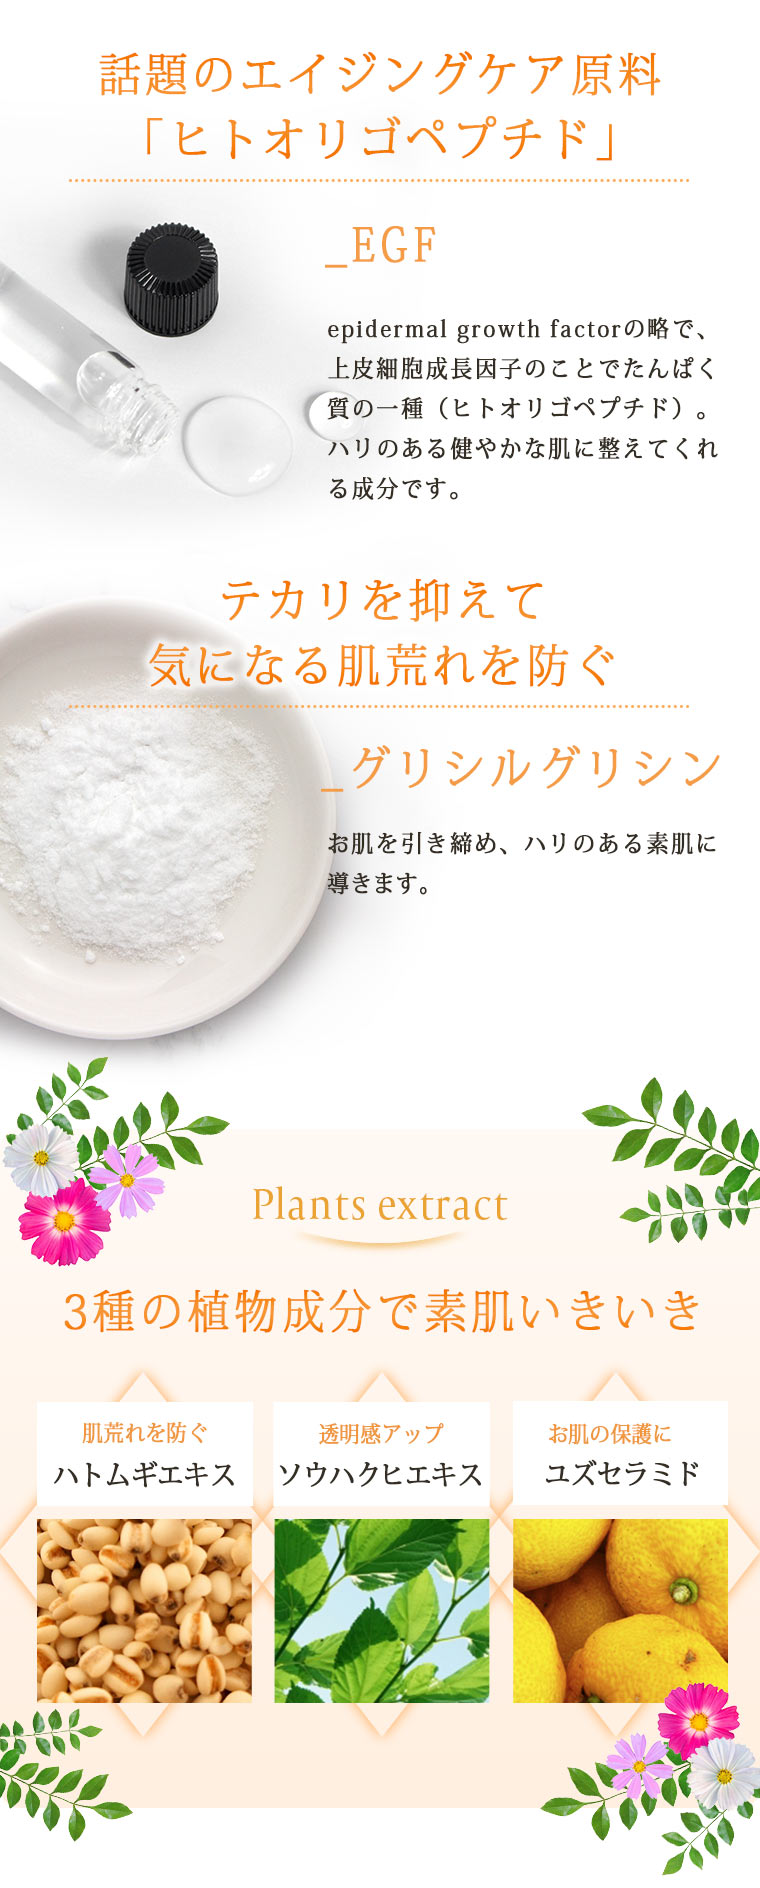 EGF・グリシルグリシン・植物エキス配合